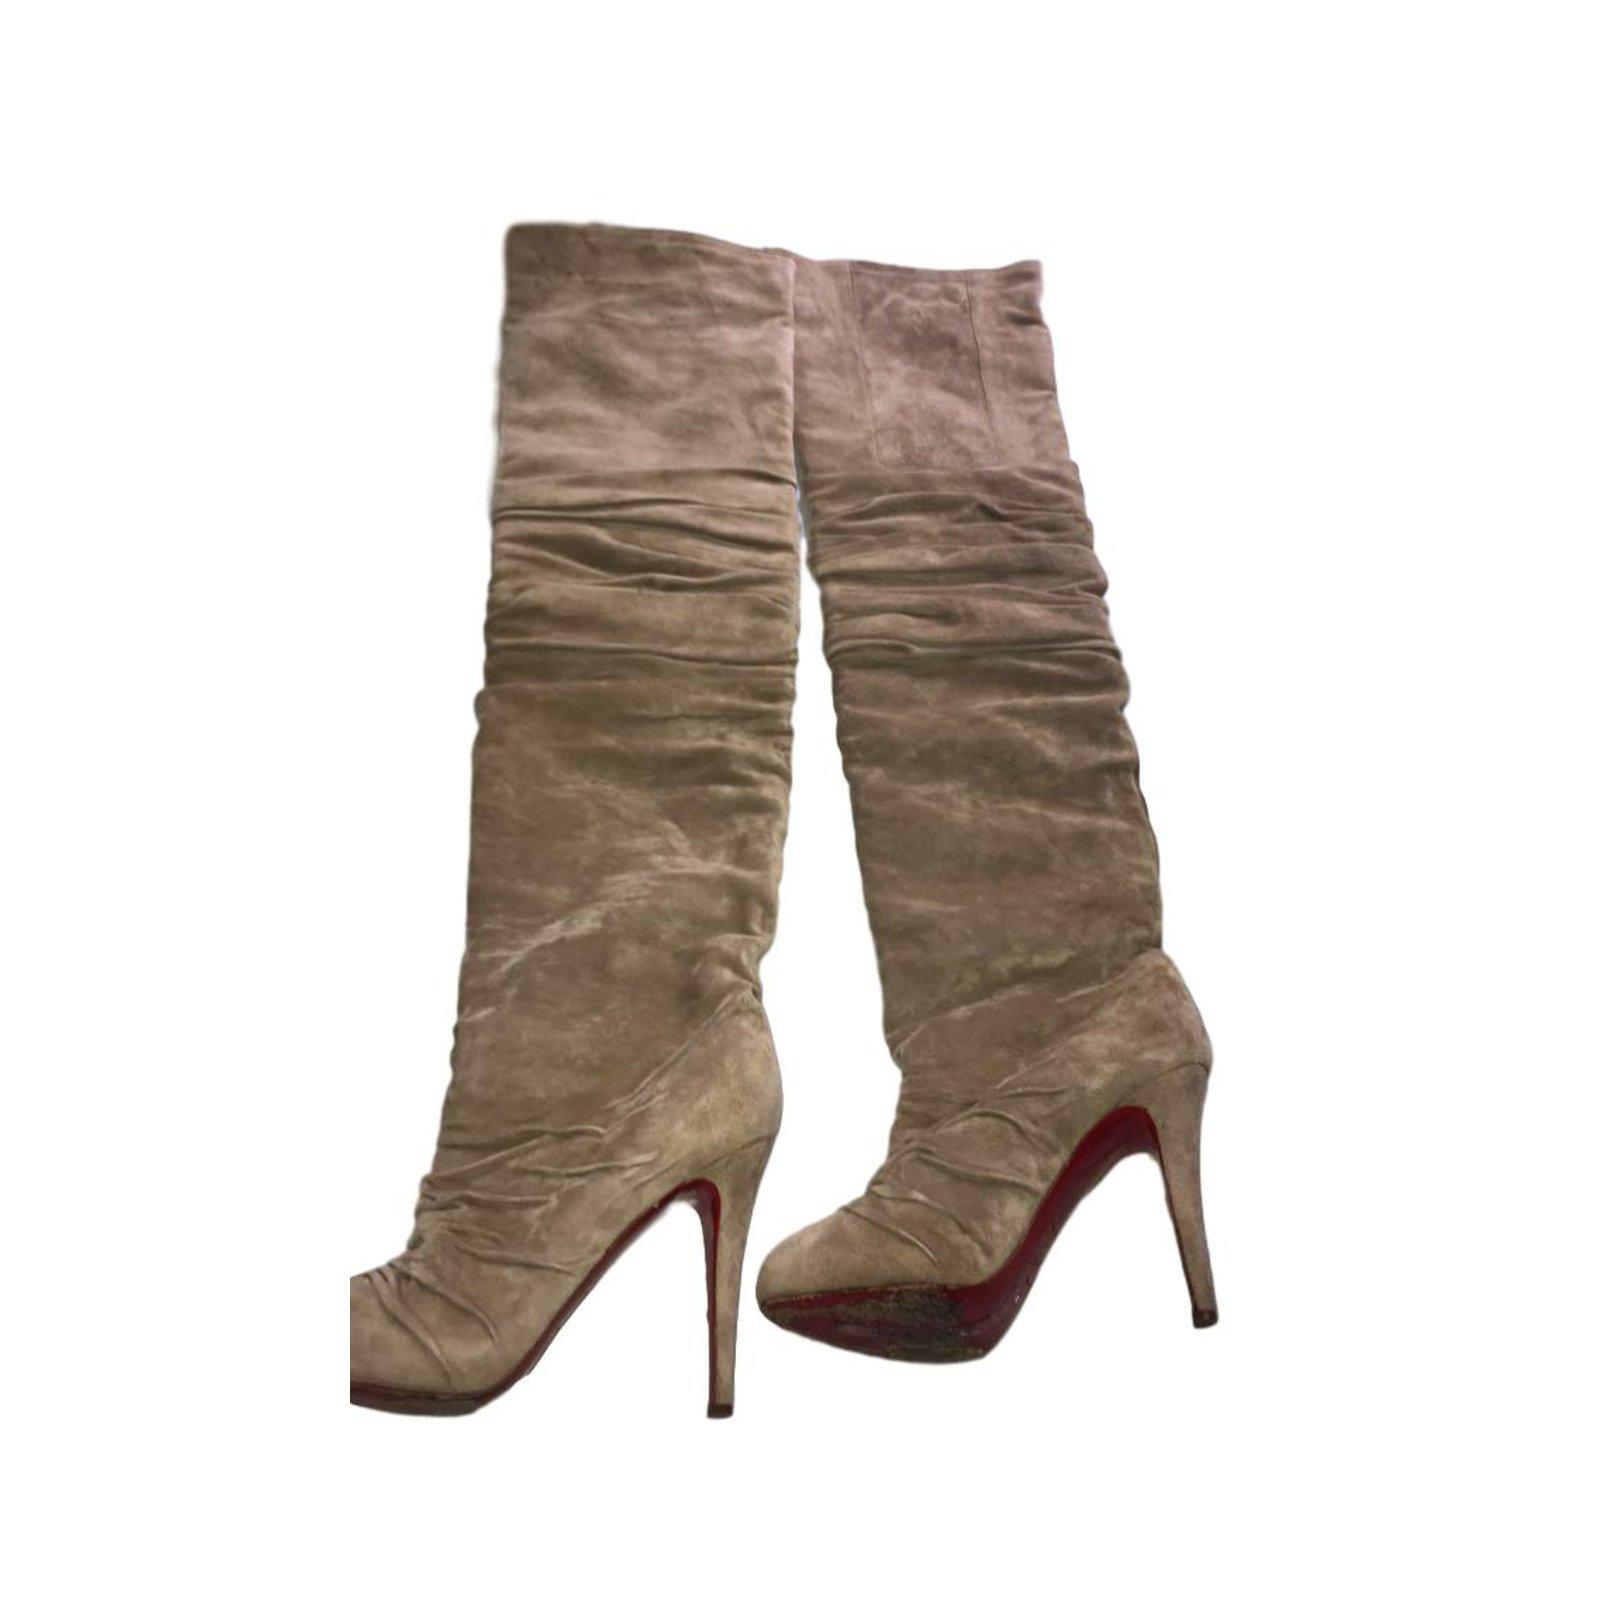 louboutin boots beige